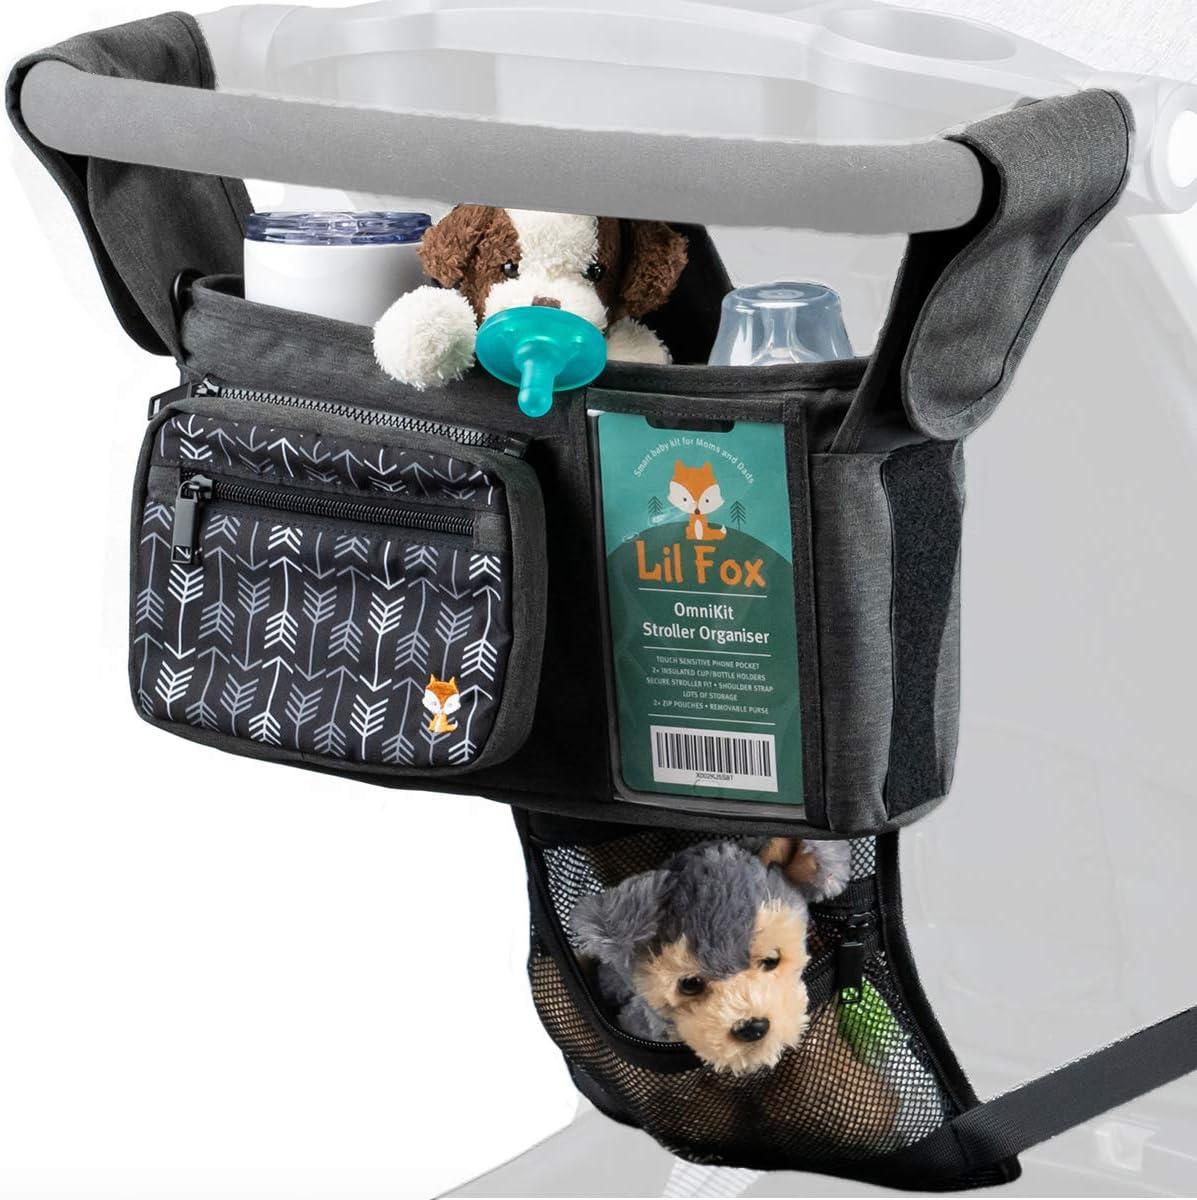 OmniKit Baby Stroller Organizer with LARGE Smart Phone Holder by Lil Fox. Stroller Bag Bottle and Stroller Cup Holder, Stroller Caddy for Baby Things. Stroller Accessories, Unisex Baby Shower Gifts